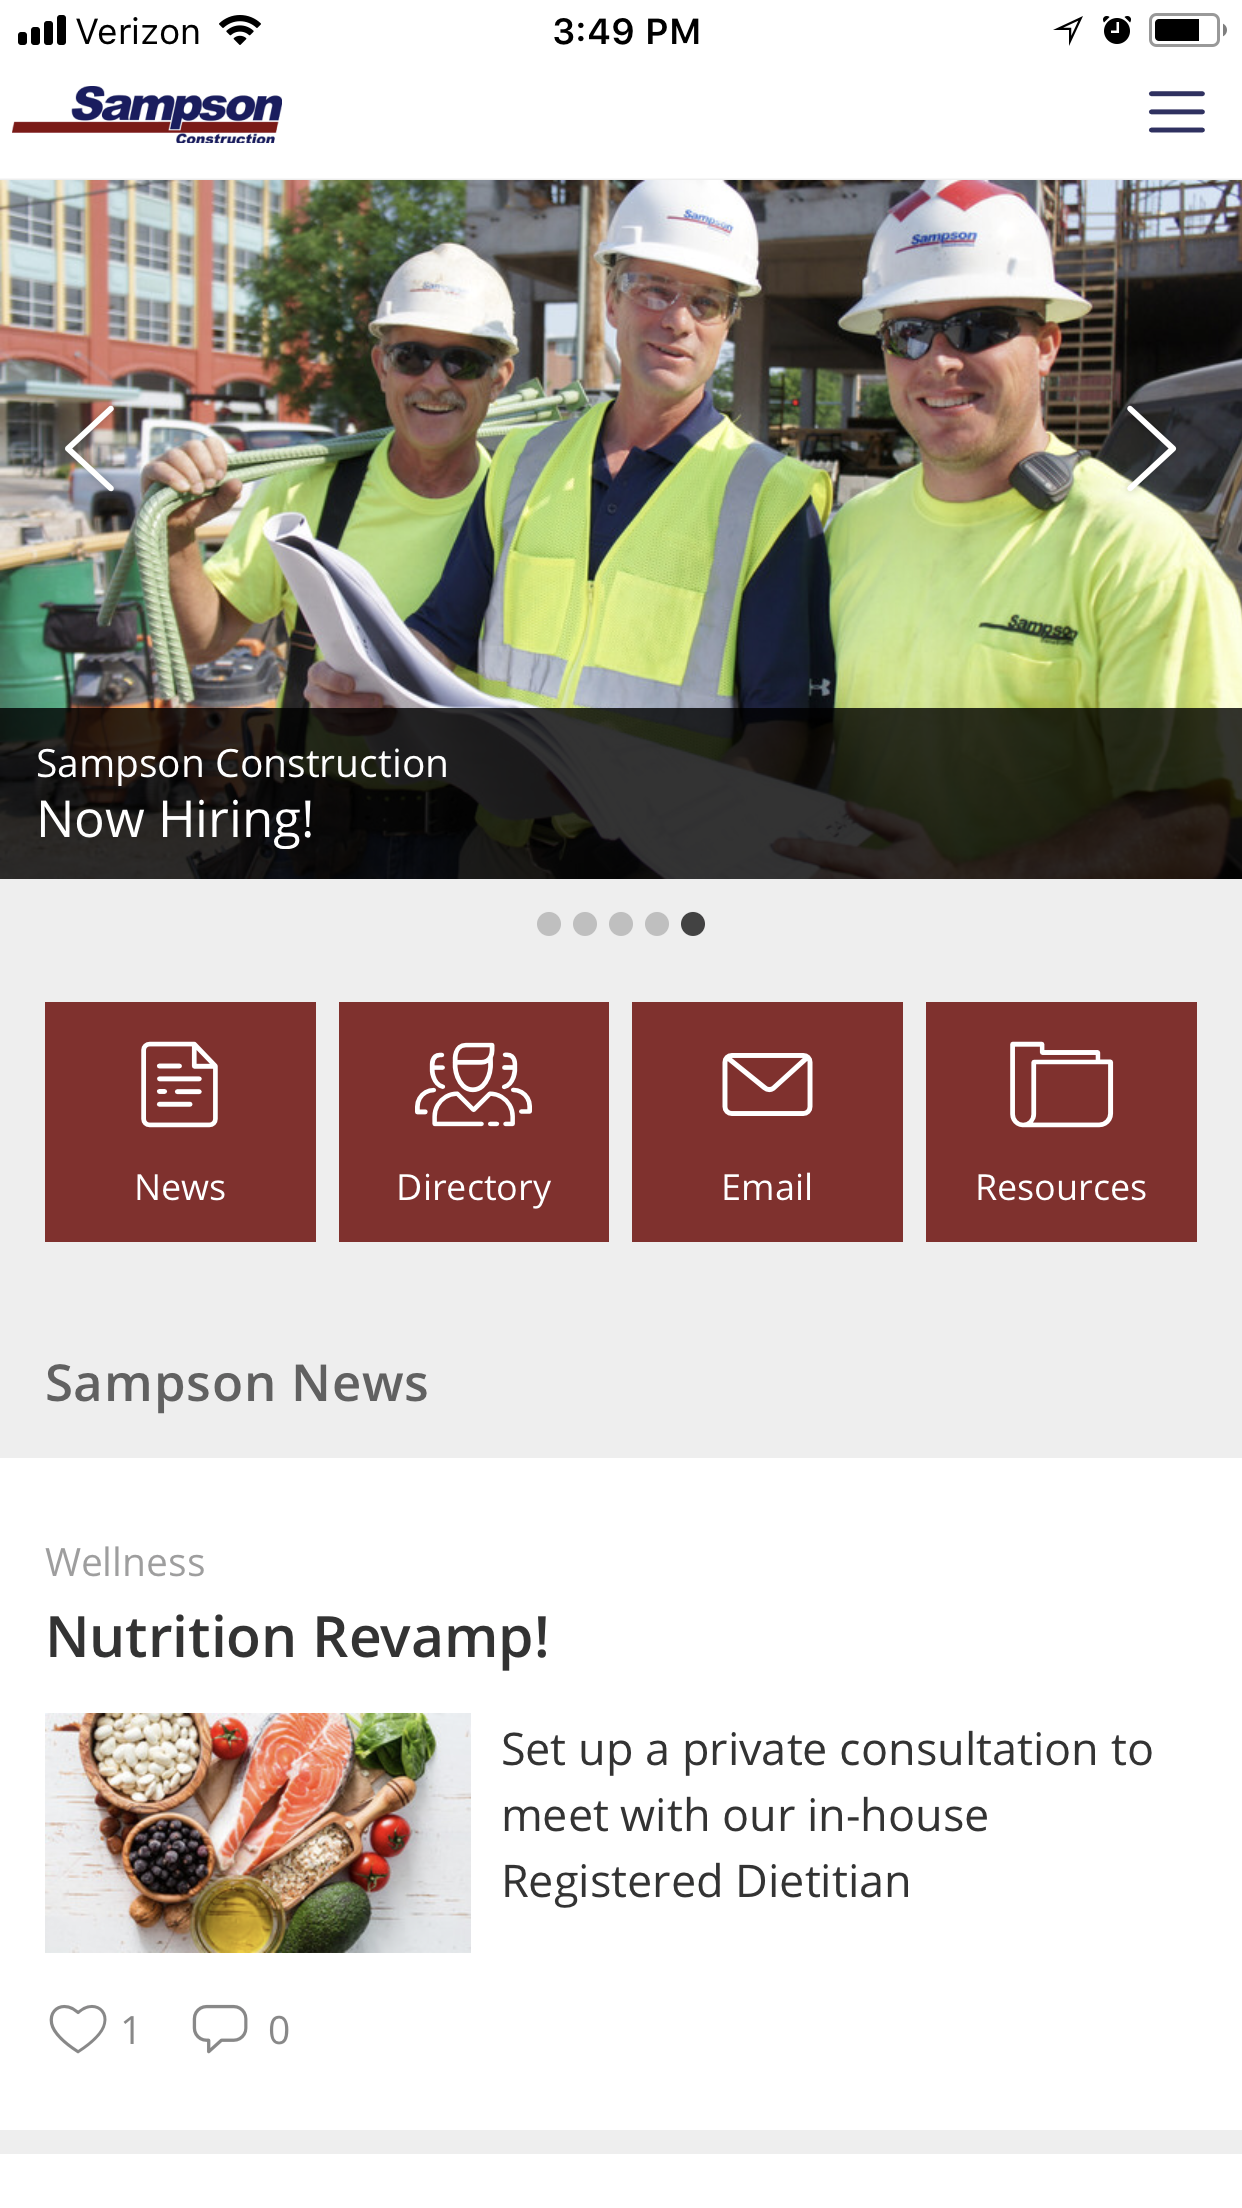 Samson Construction mobile app